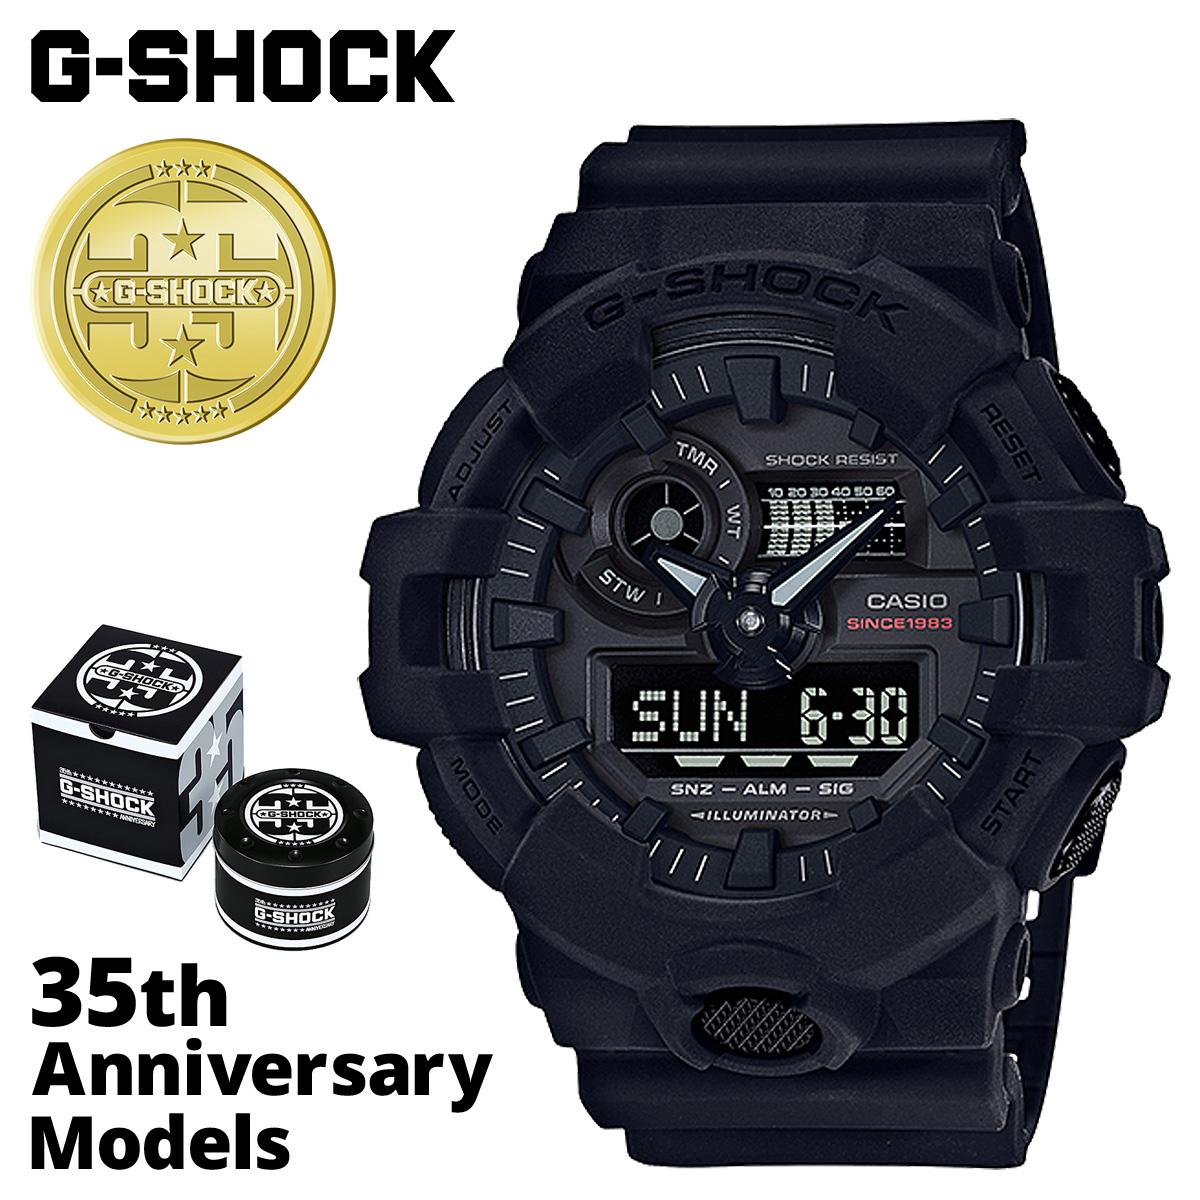 CASIO カシオ G-SHOCK 腕時計 GA-735A-1AJR BIG BANG BLACK 35周年 ジーショック Gショック G-ショック ブラック メンズ レディース